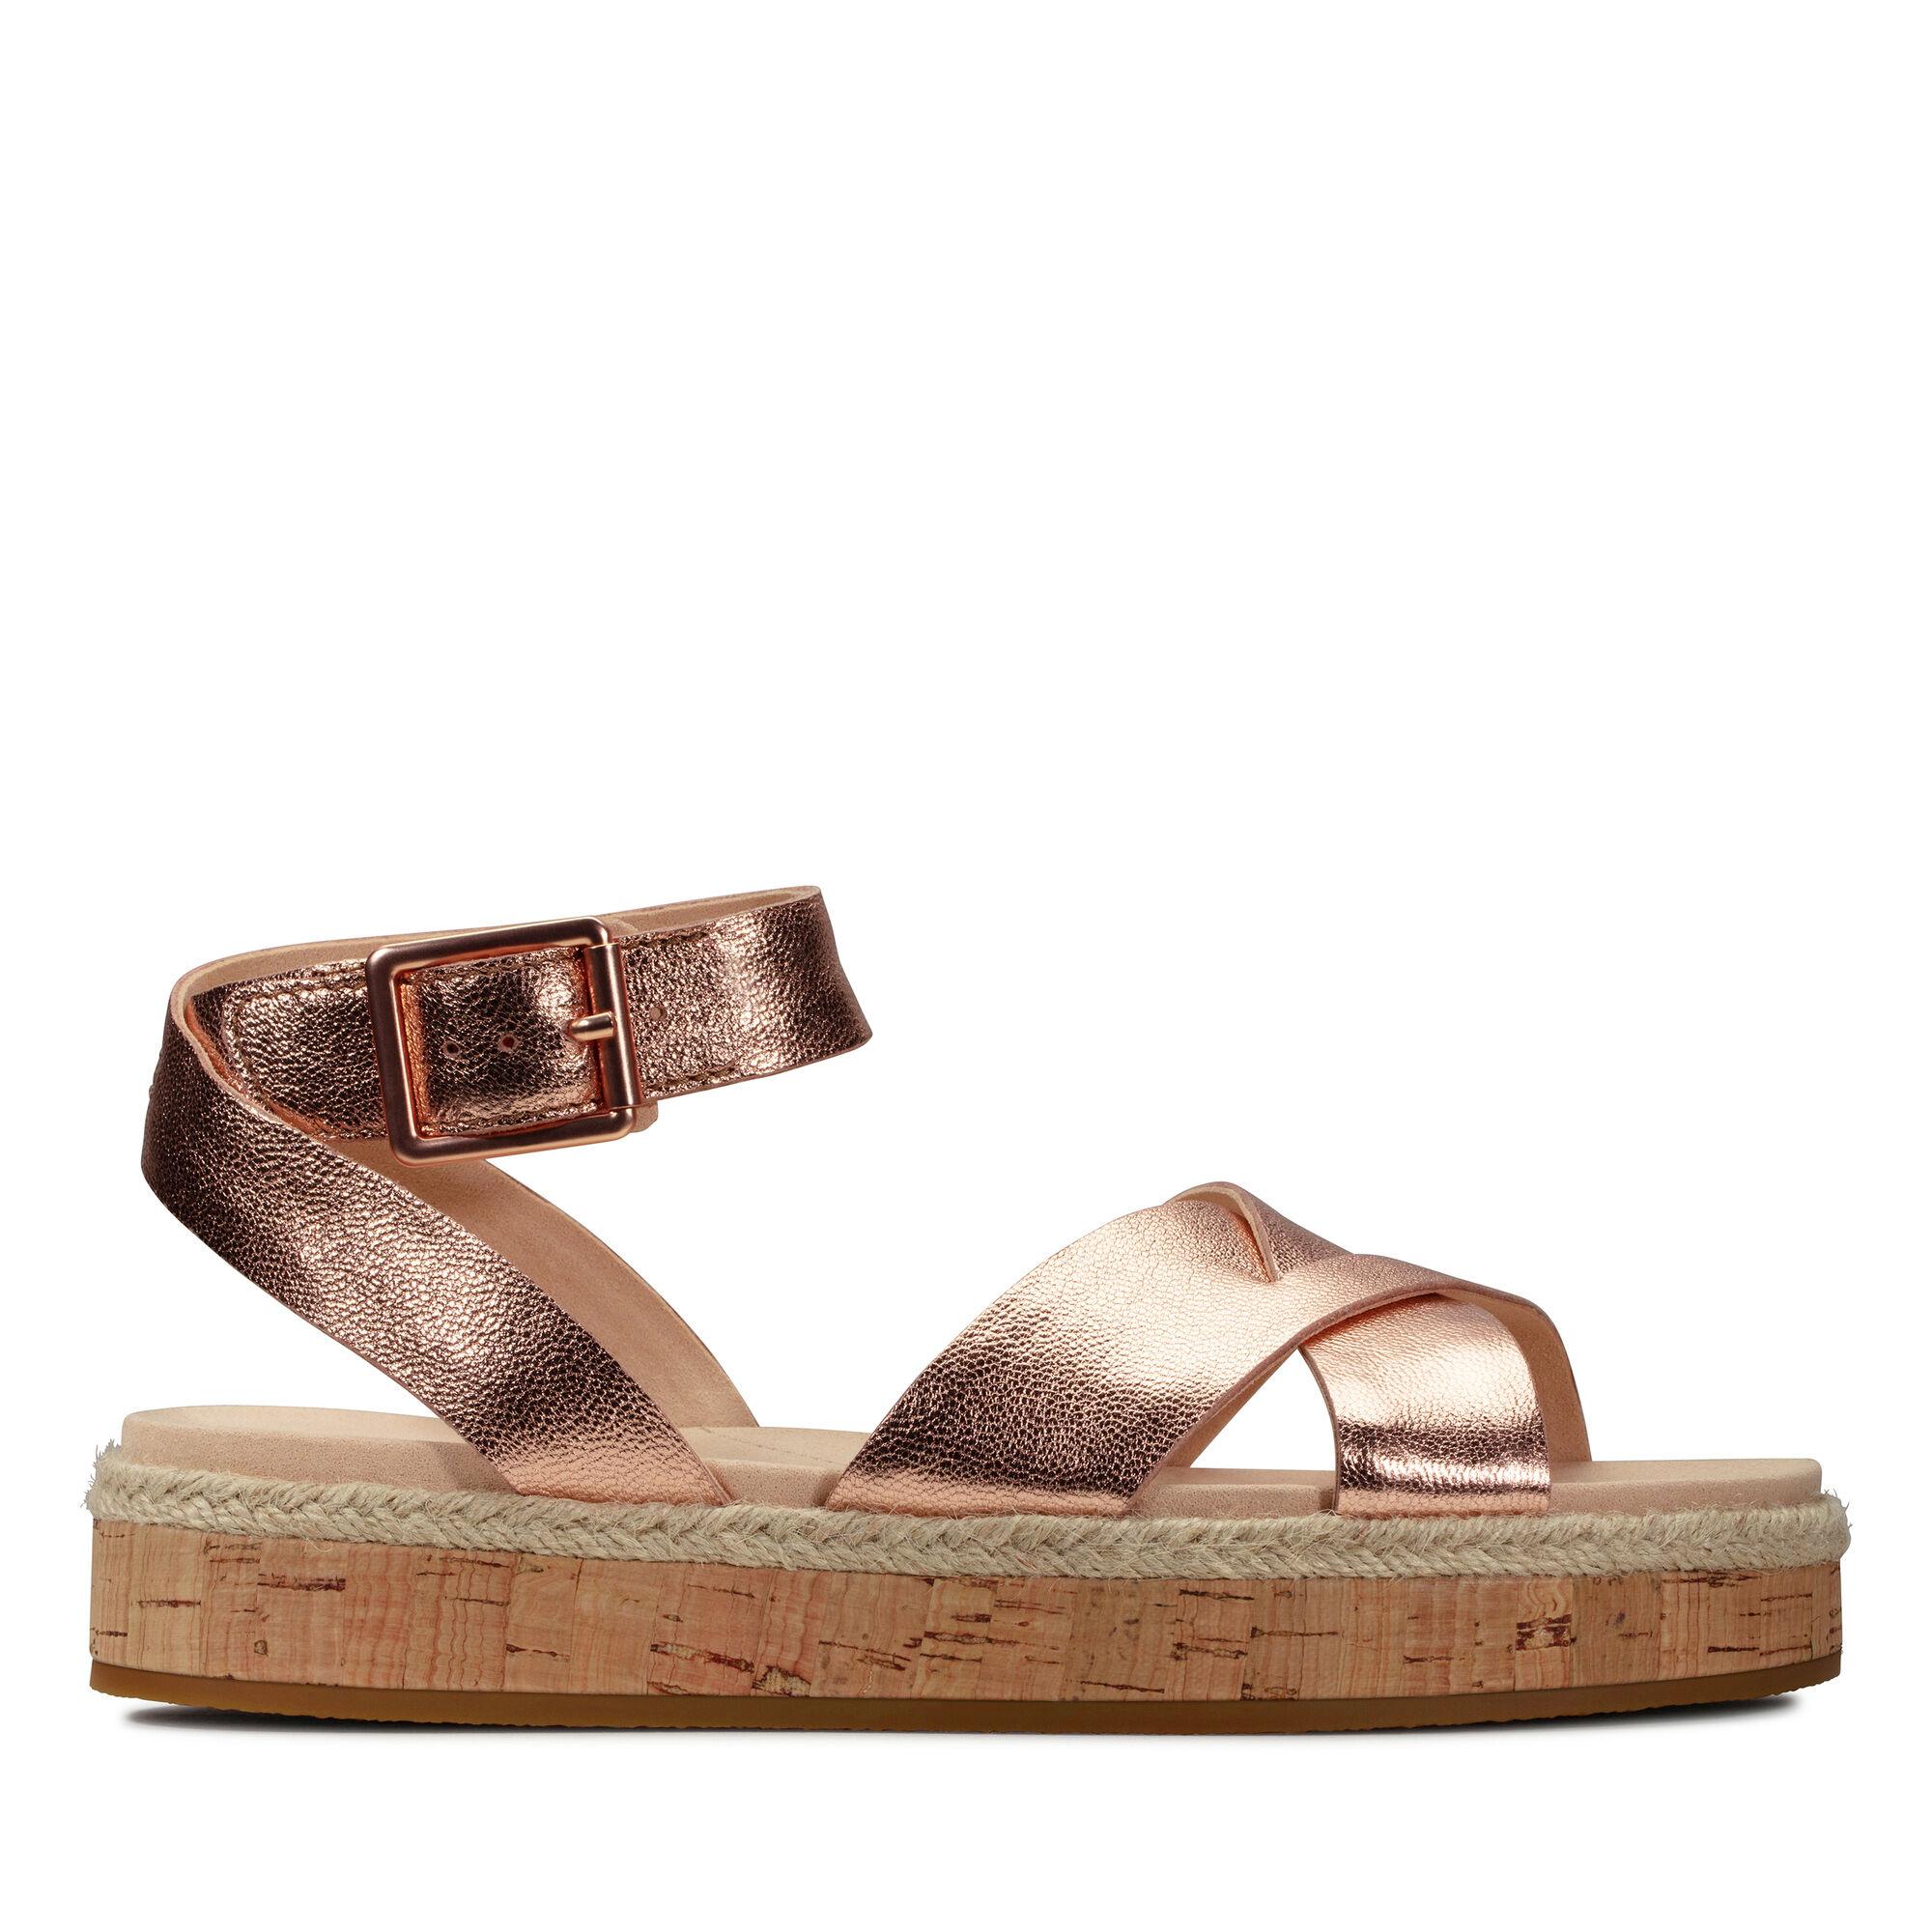 Clarks Sandalen Damen | Sandaletten Damen | Hochwertige